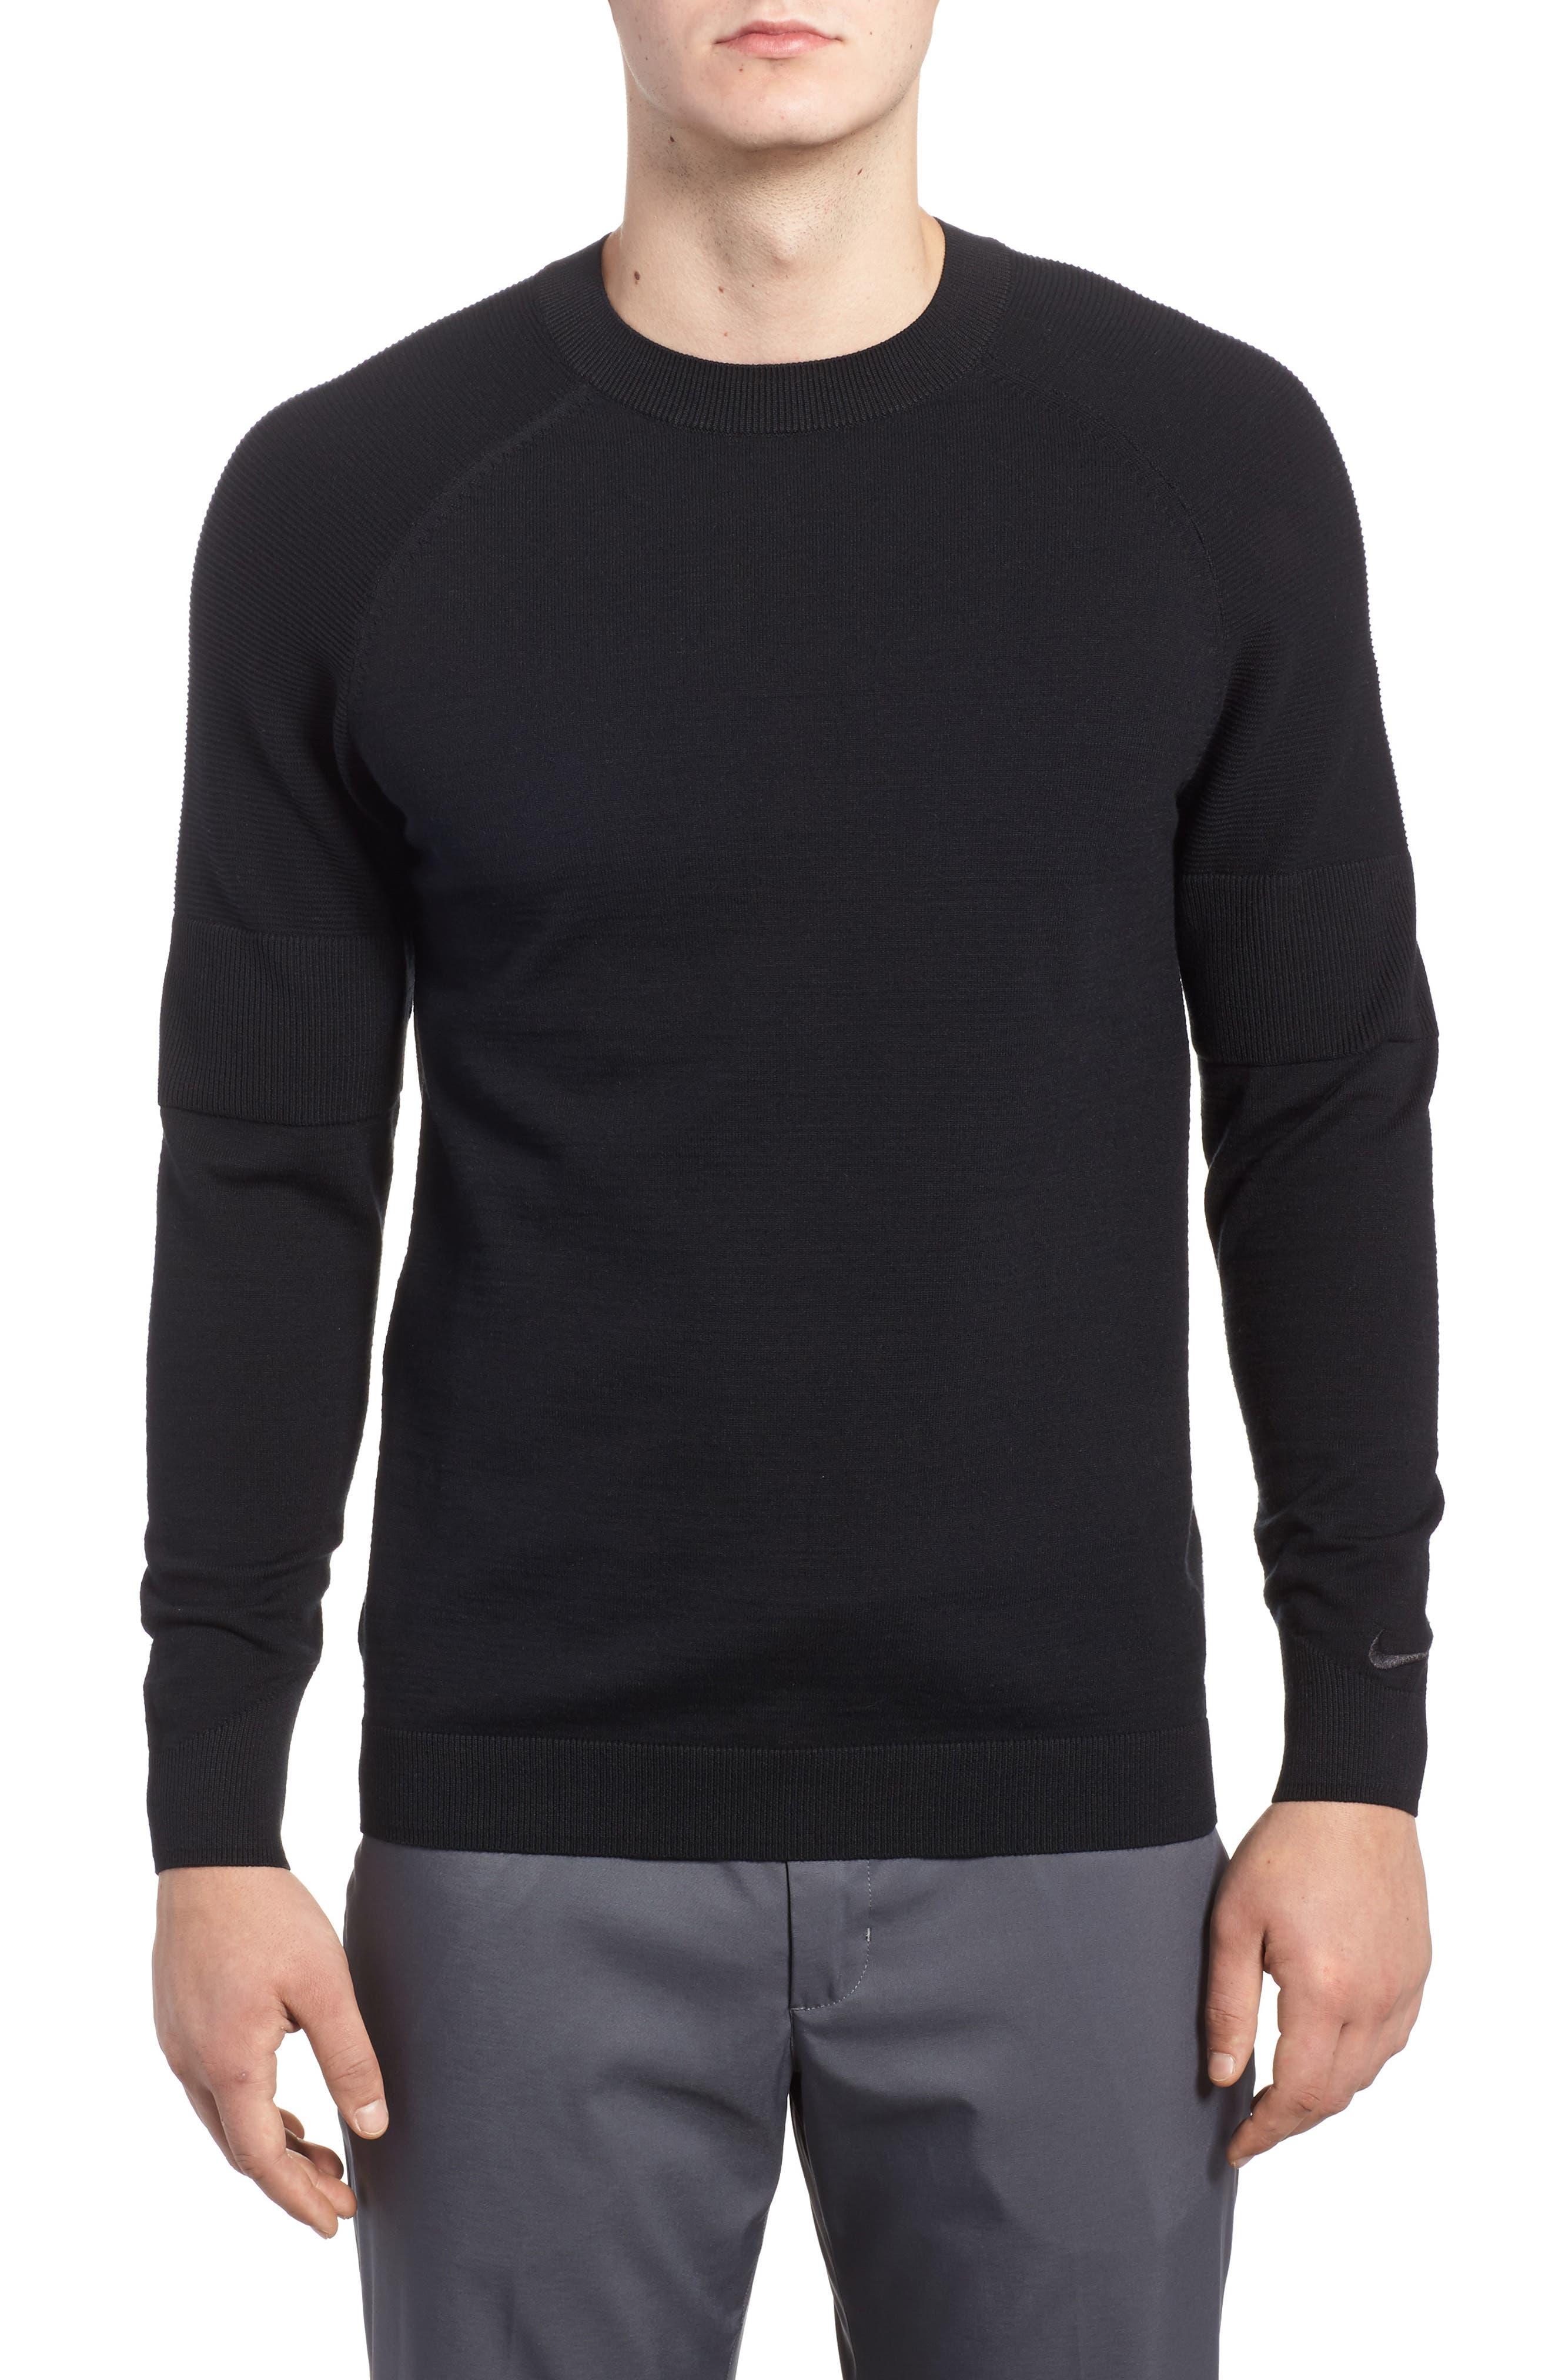 Nike TW Cotton Blend Sweatshirt